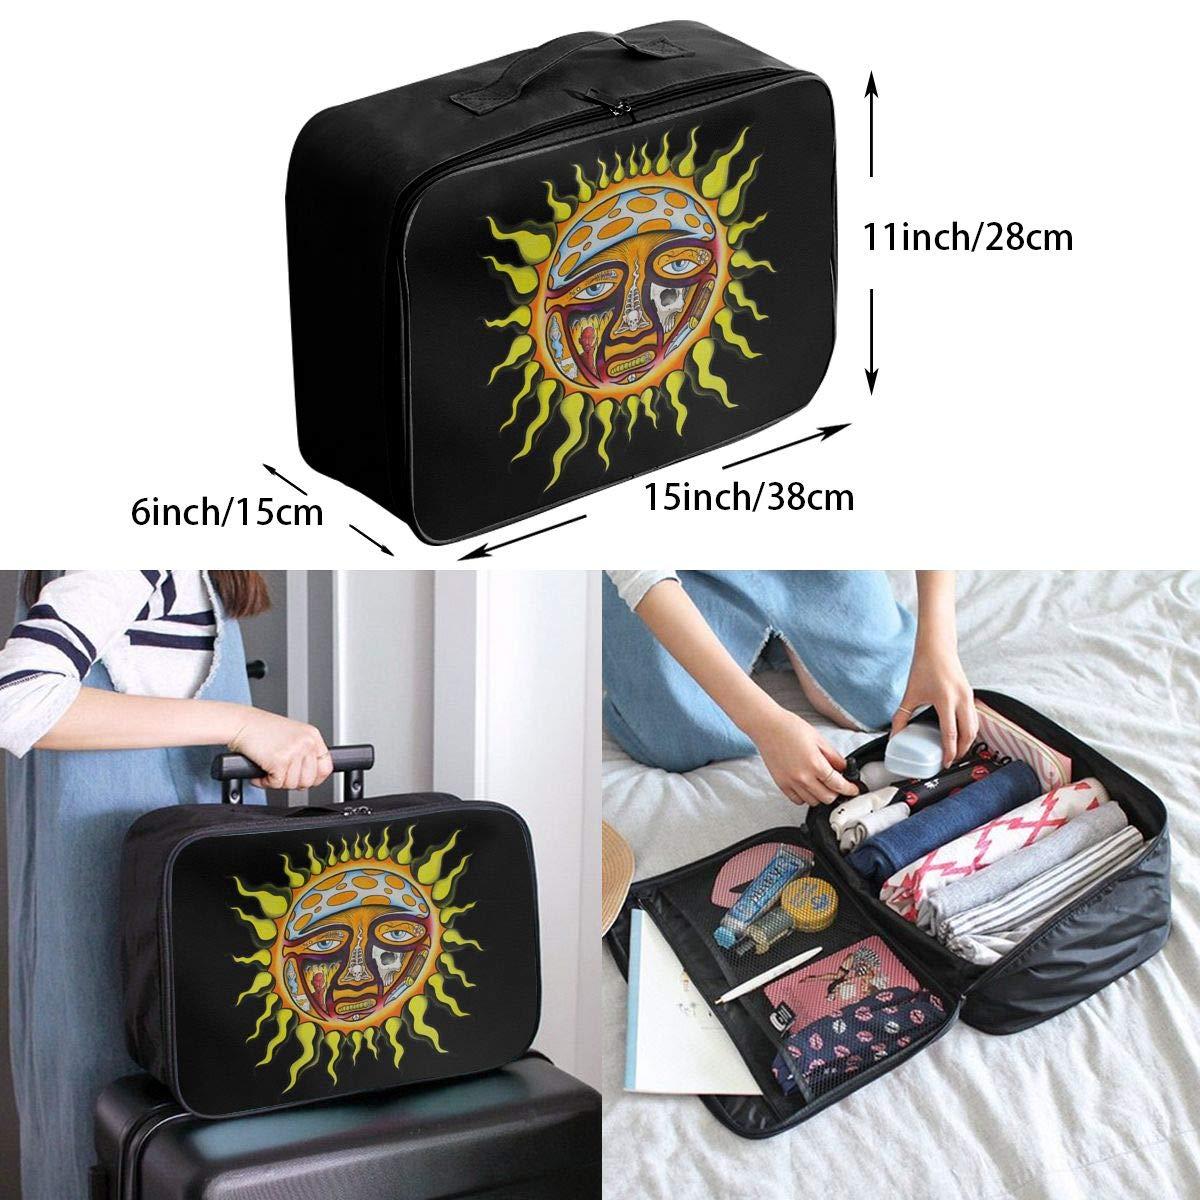 Sublimes Iconic Sun Logo Travel Bag Men Women 3D Print Pattern Gift Portable Waterproof Oxford Cloth Bags